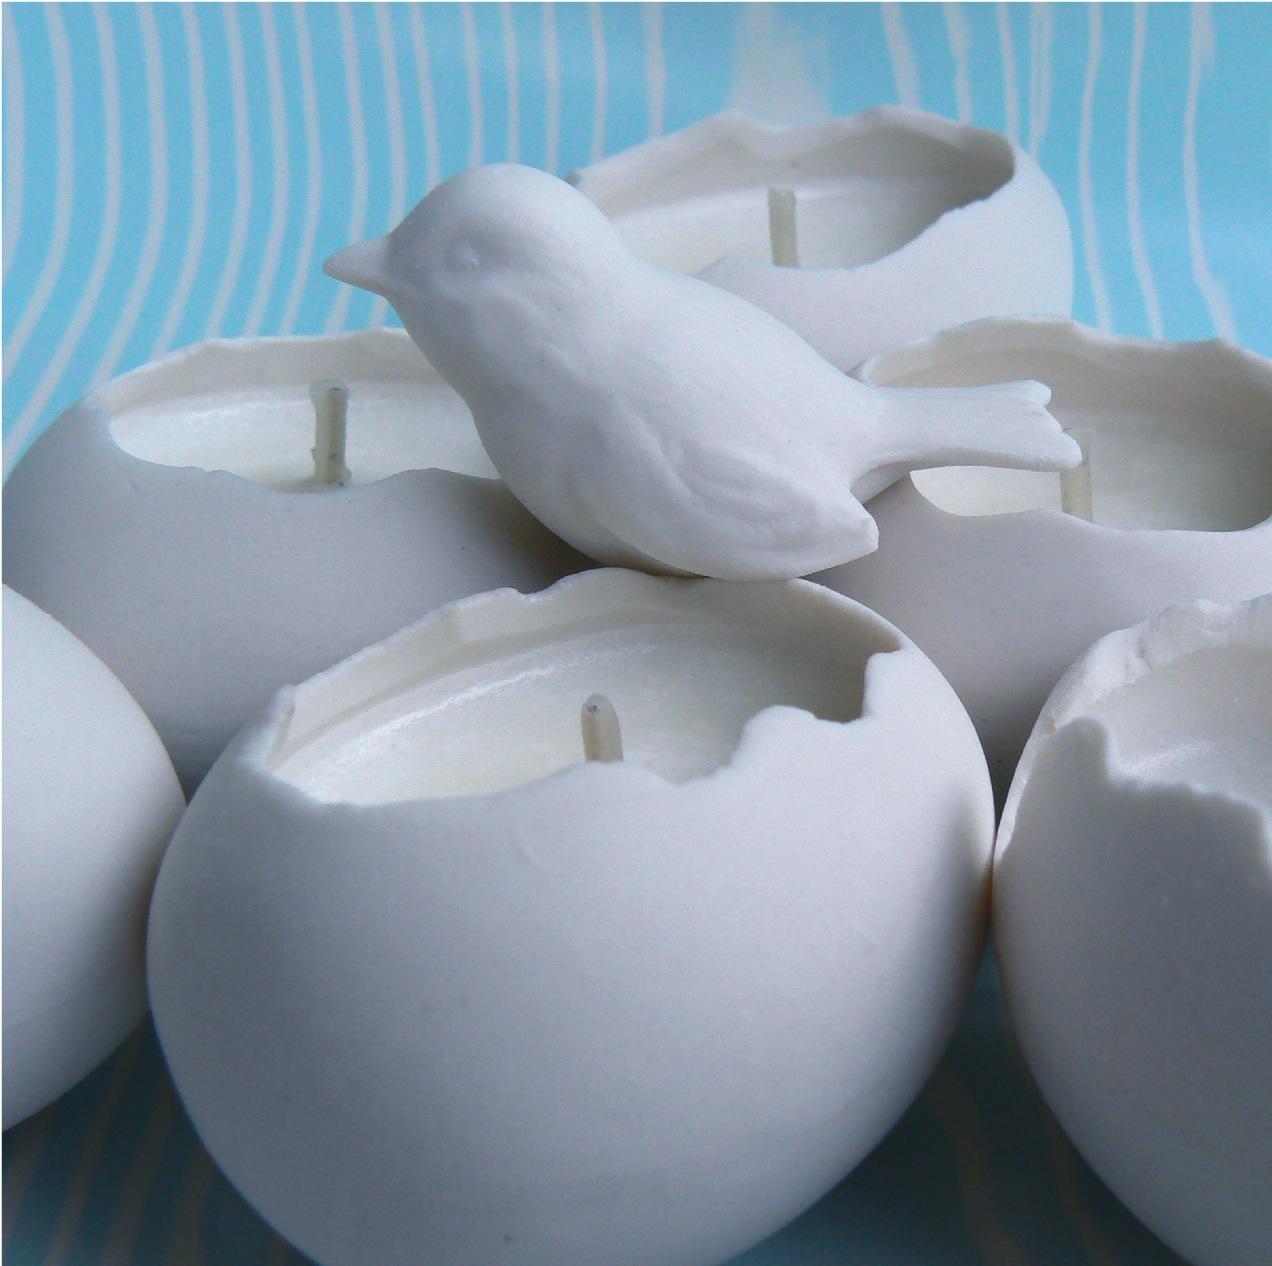 http://3.bp.blogspot.com/_NR-pTkG6FHE/TEGTu-SYqDI/AAAAAAAAA4s/LLVYqmZDl5Y/s1600/Translucent_Porcelain_Candles_.jpg